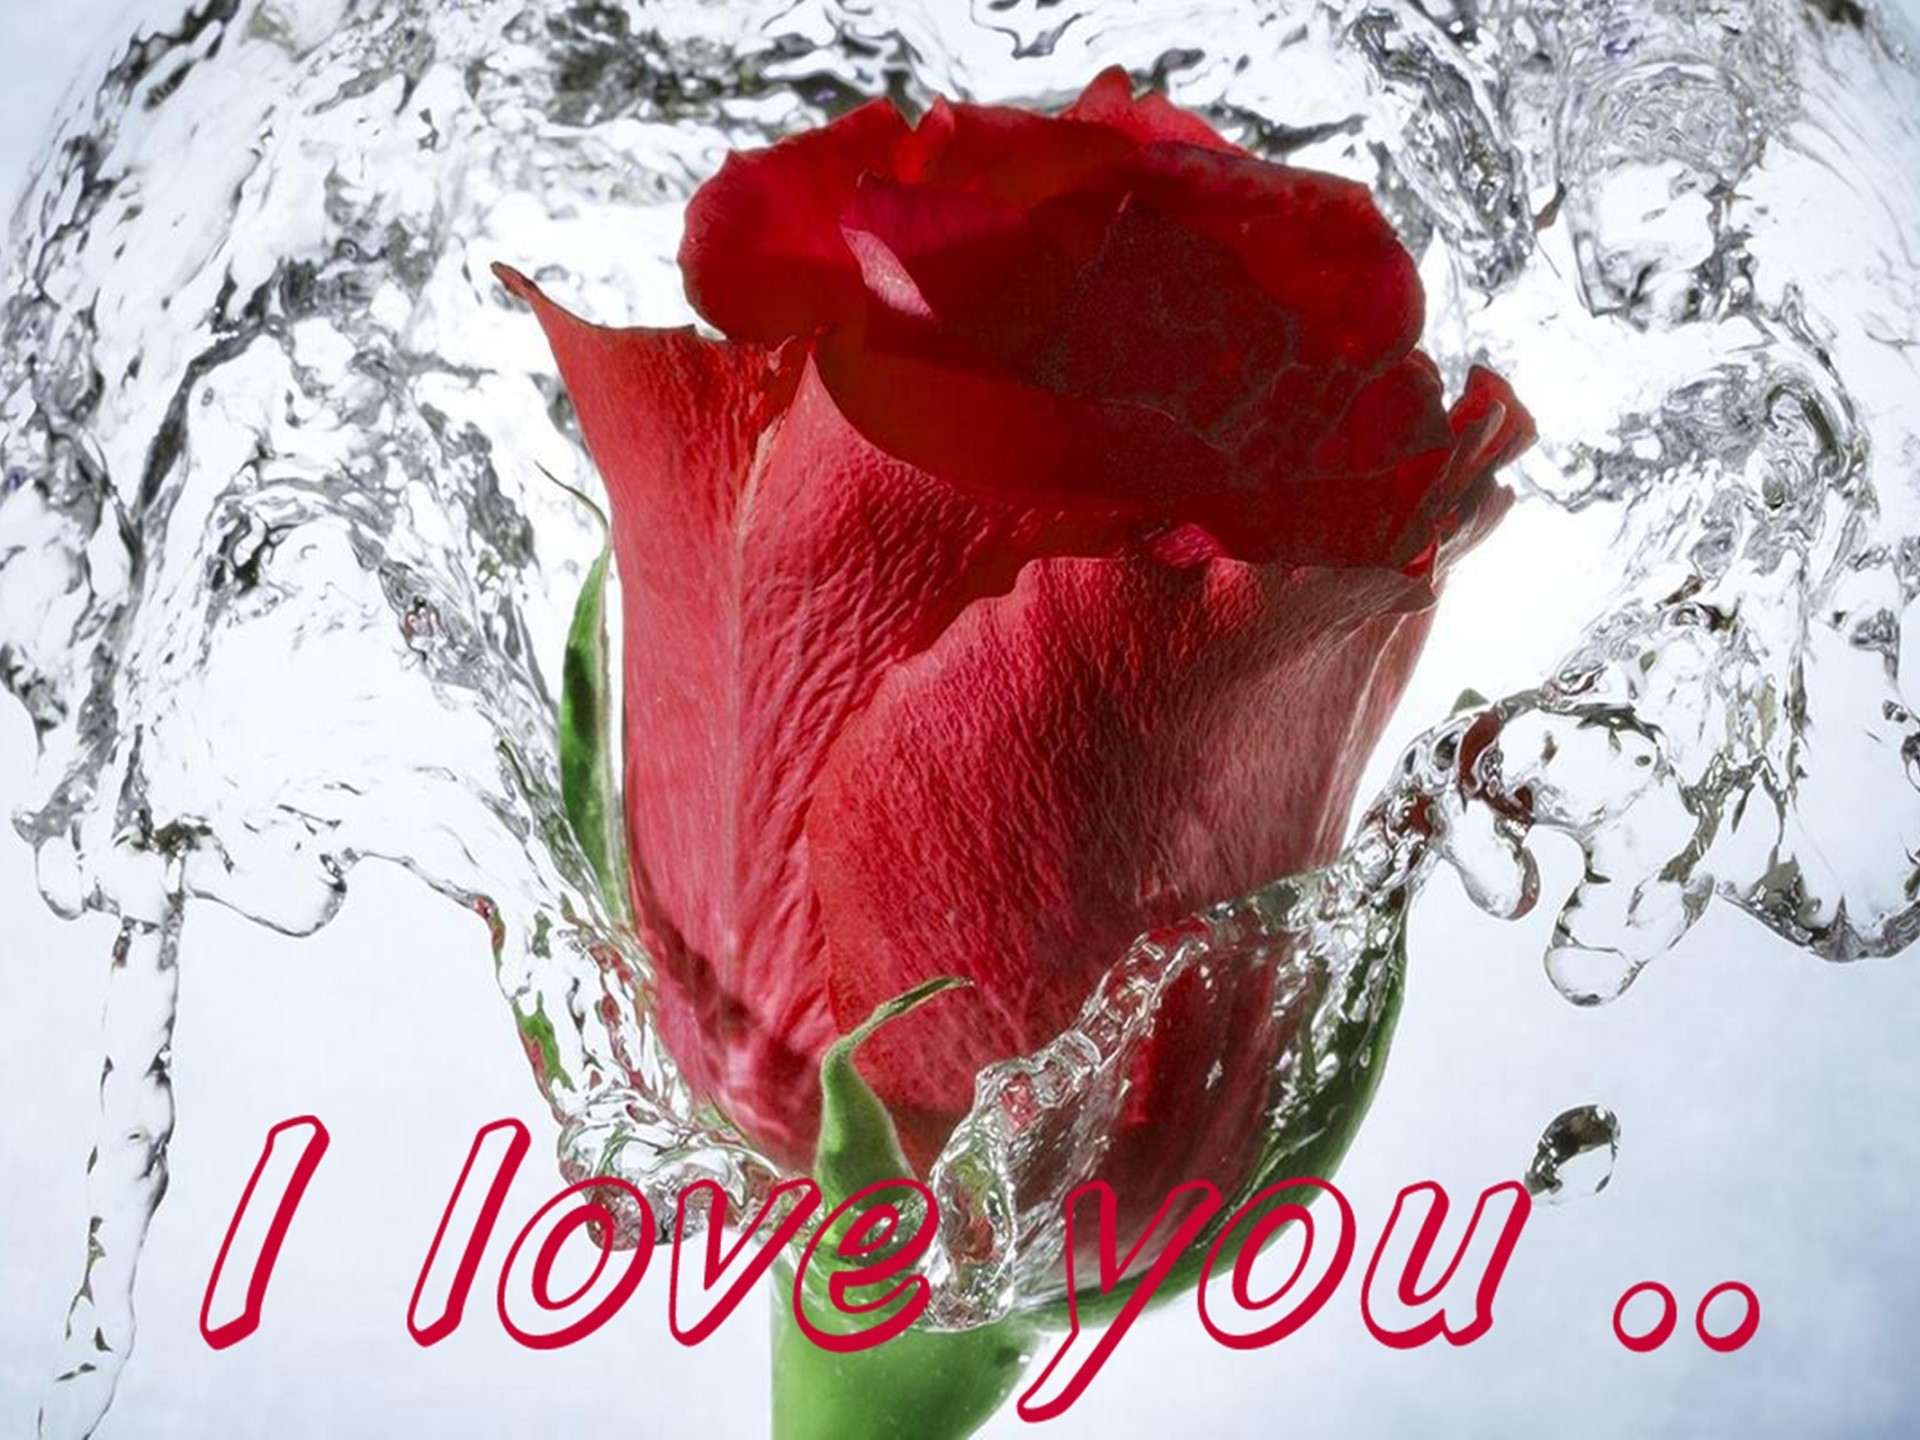 Red Rose Wallpaper Hd - Red Rose I Love U , HD Wallpaper & Backgrounds